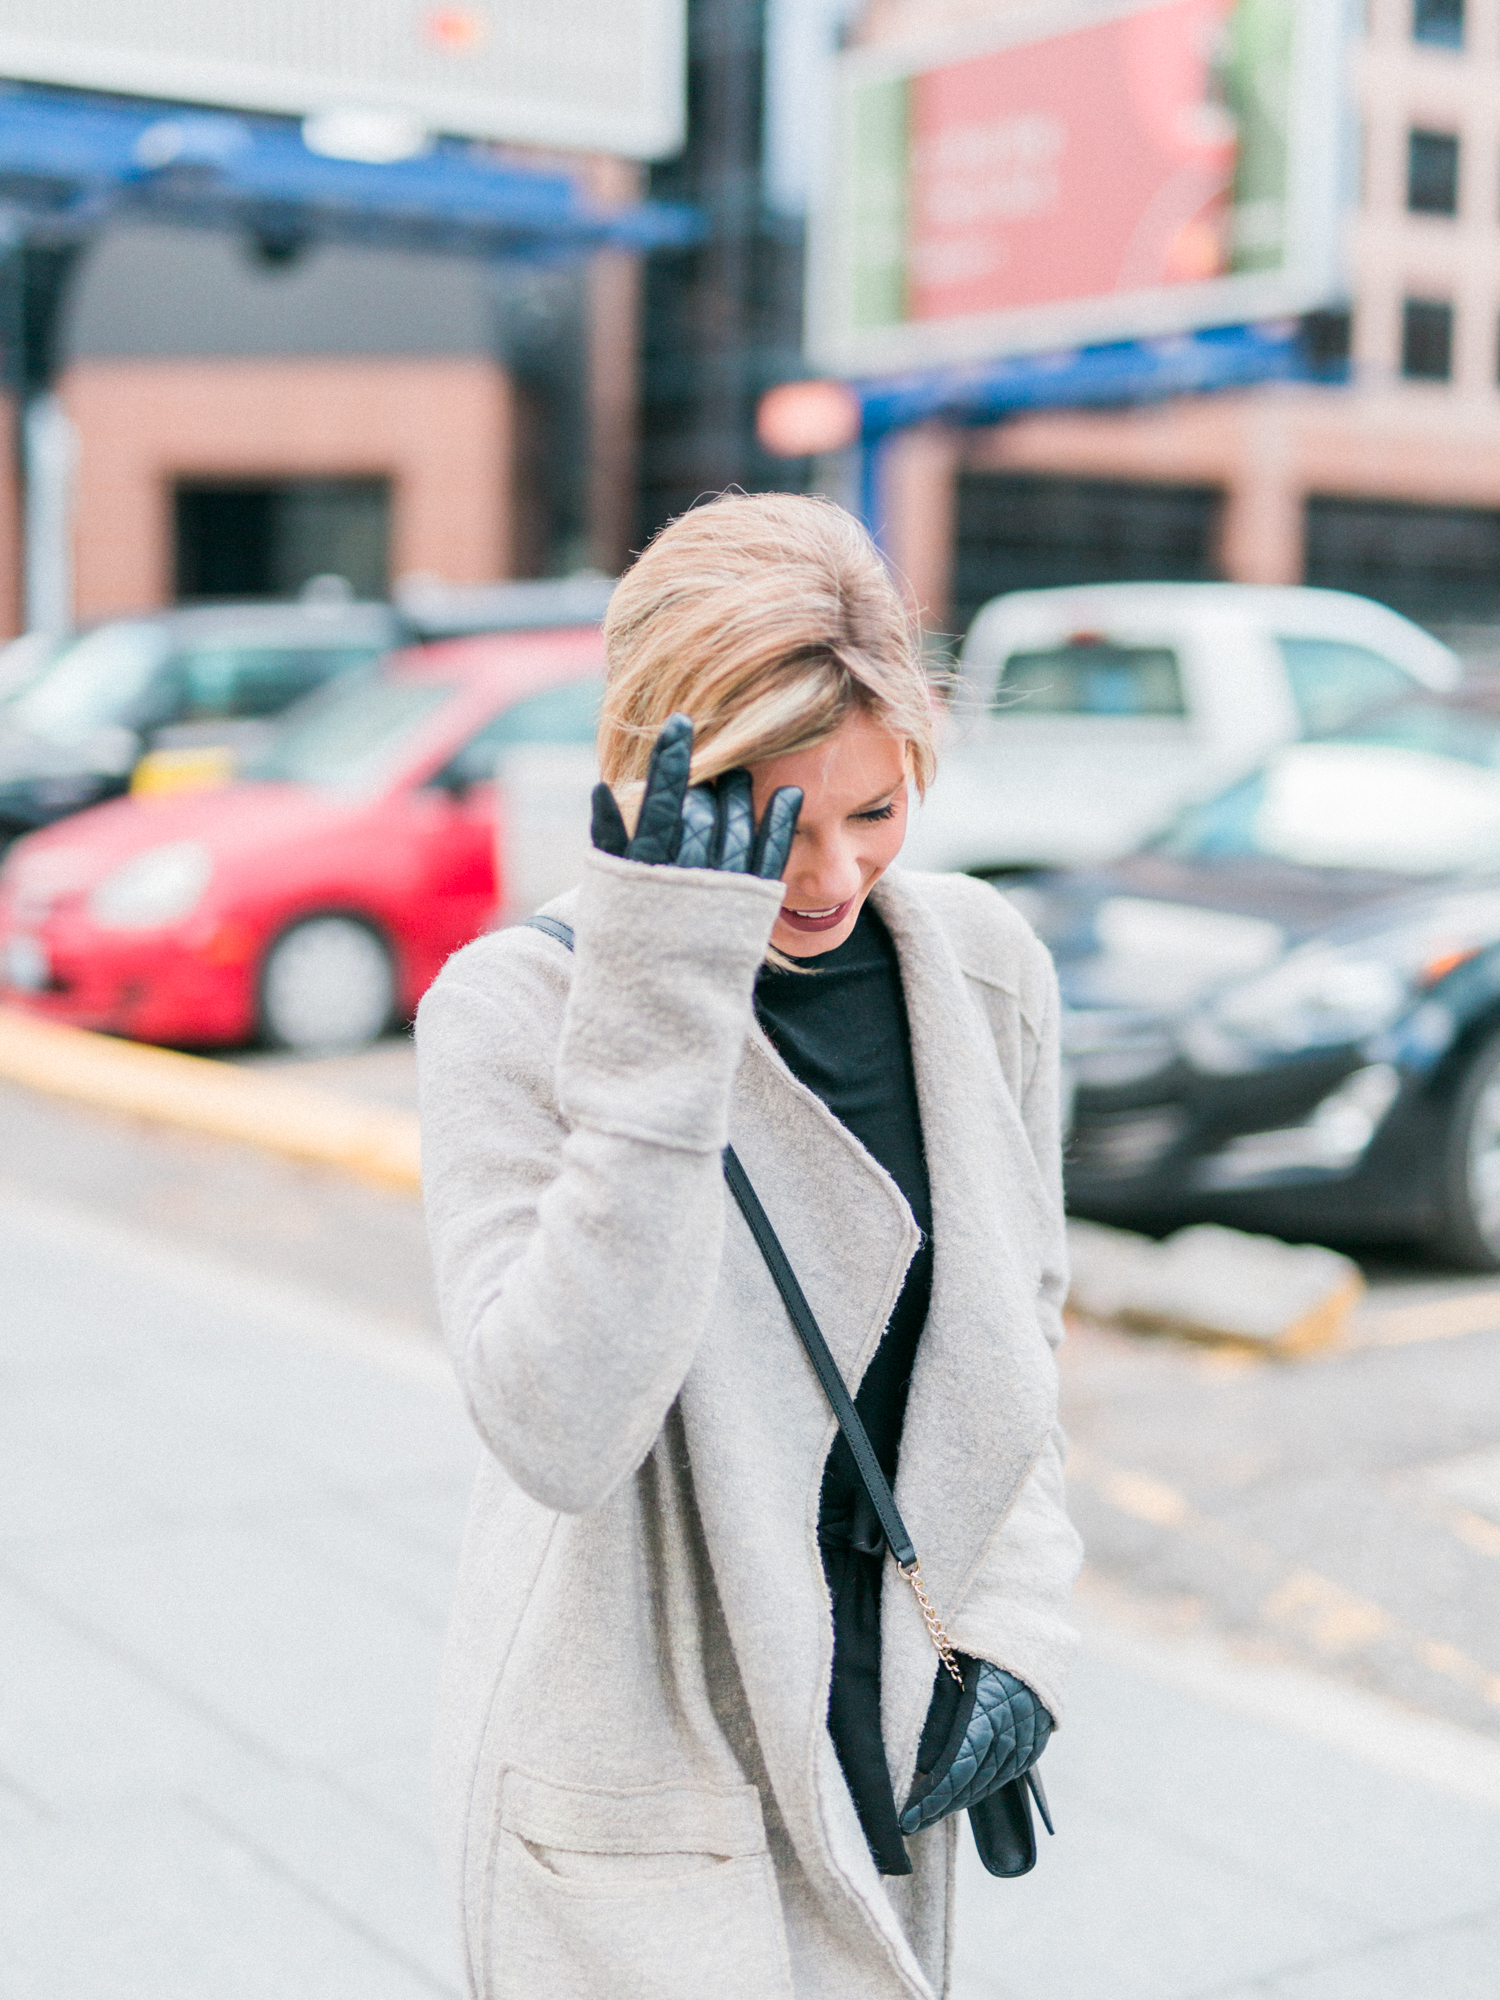 DanielleGirouxPhotography_Toronto_Portrait_StreetPhotography_0C6A1015.jpg